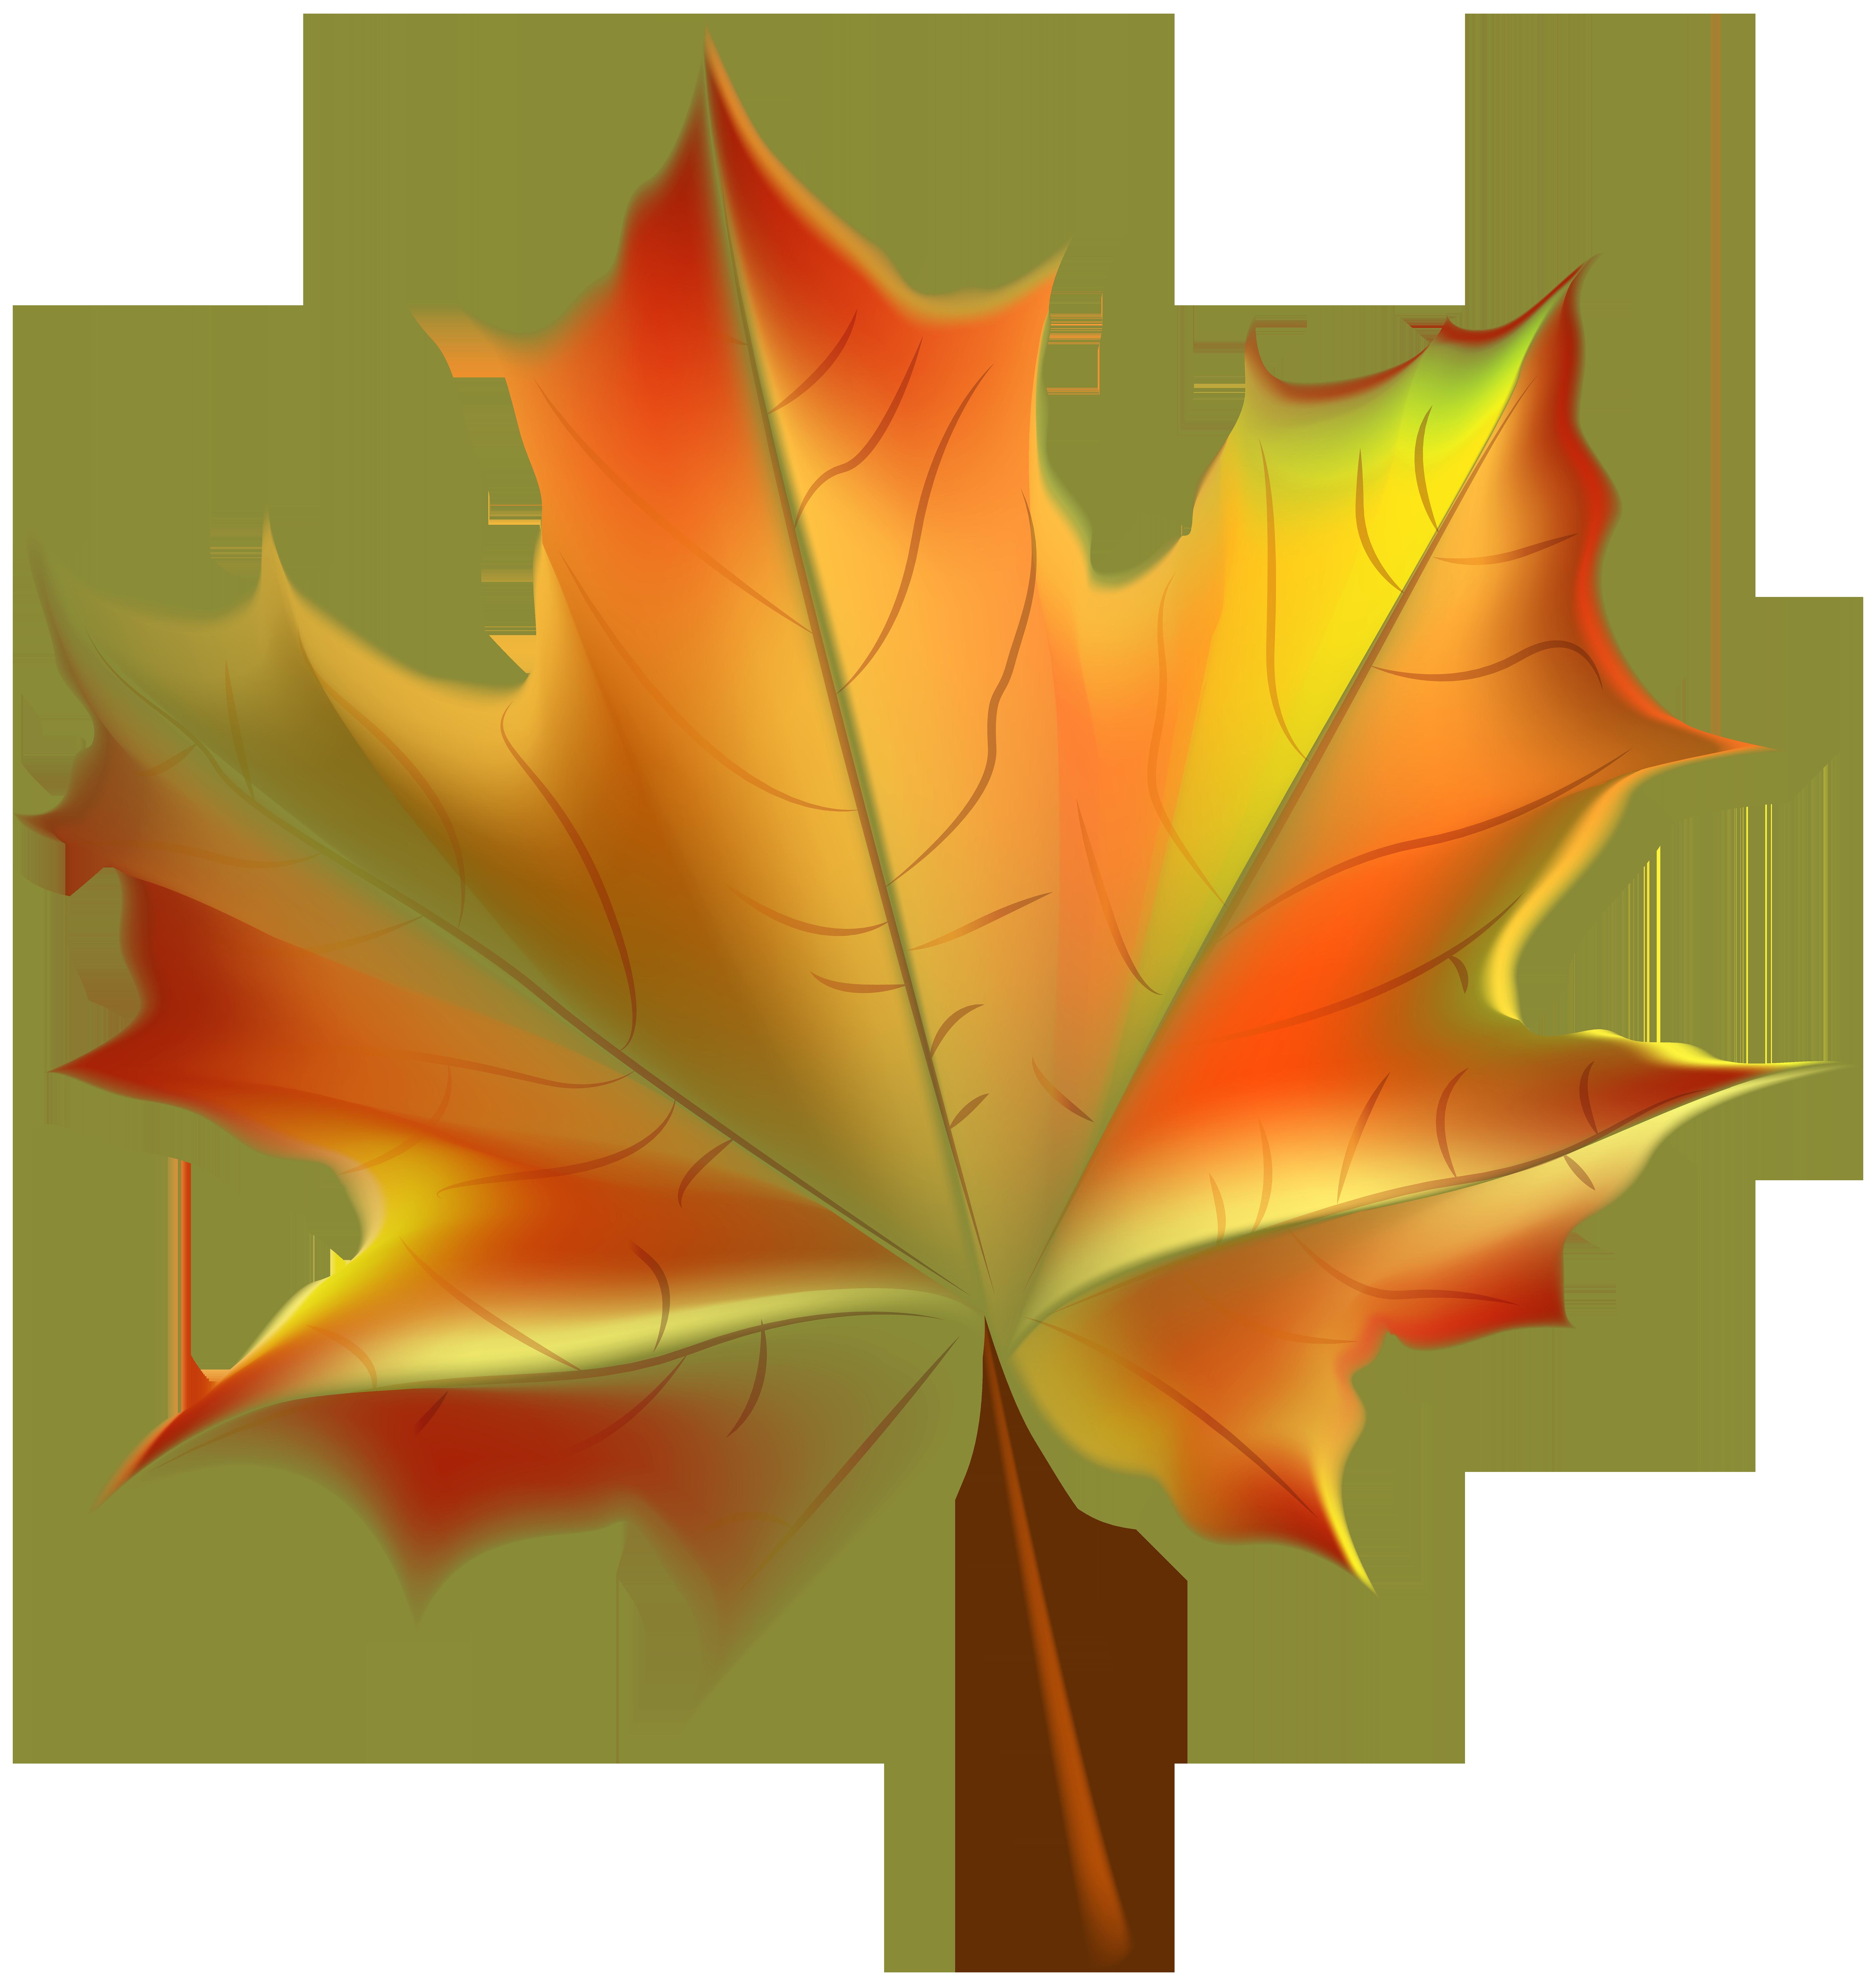 Leaf clipart transparent background. Beautiful autumn png clip